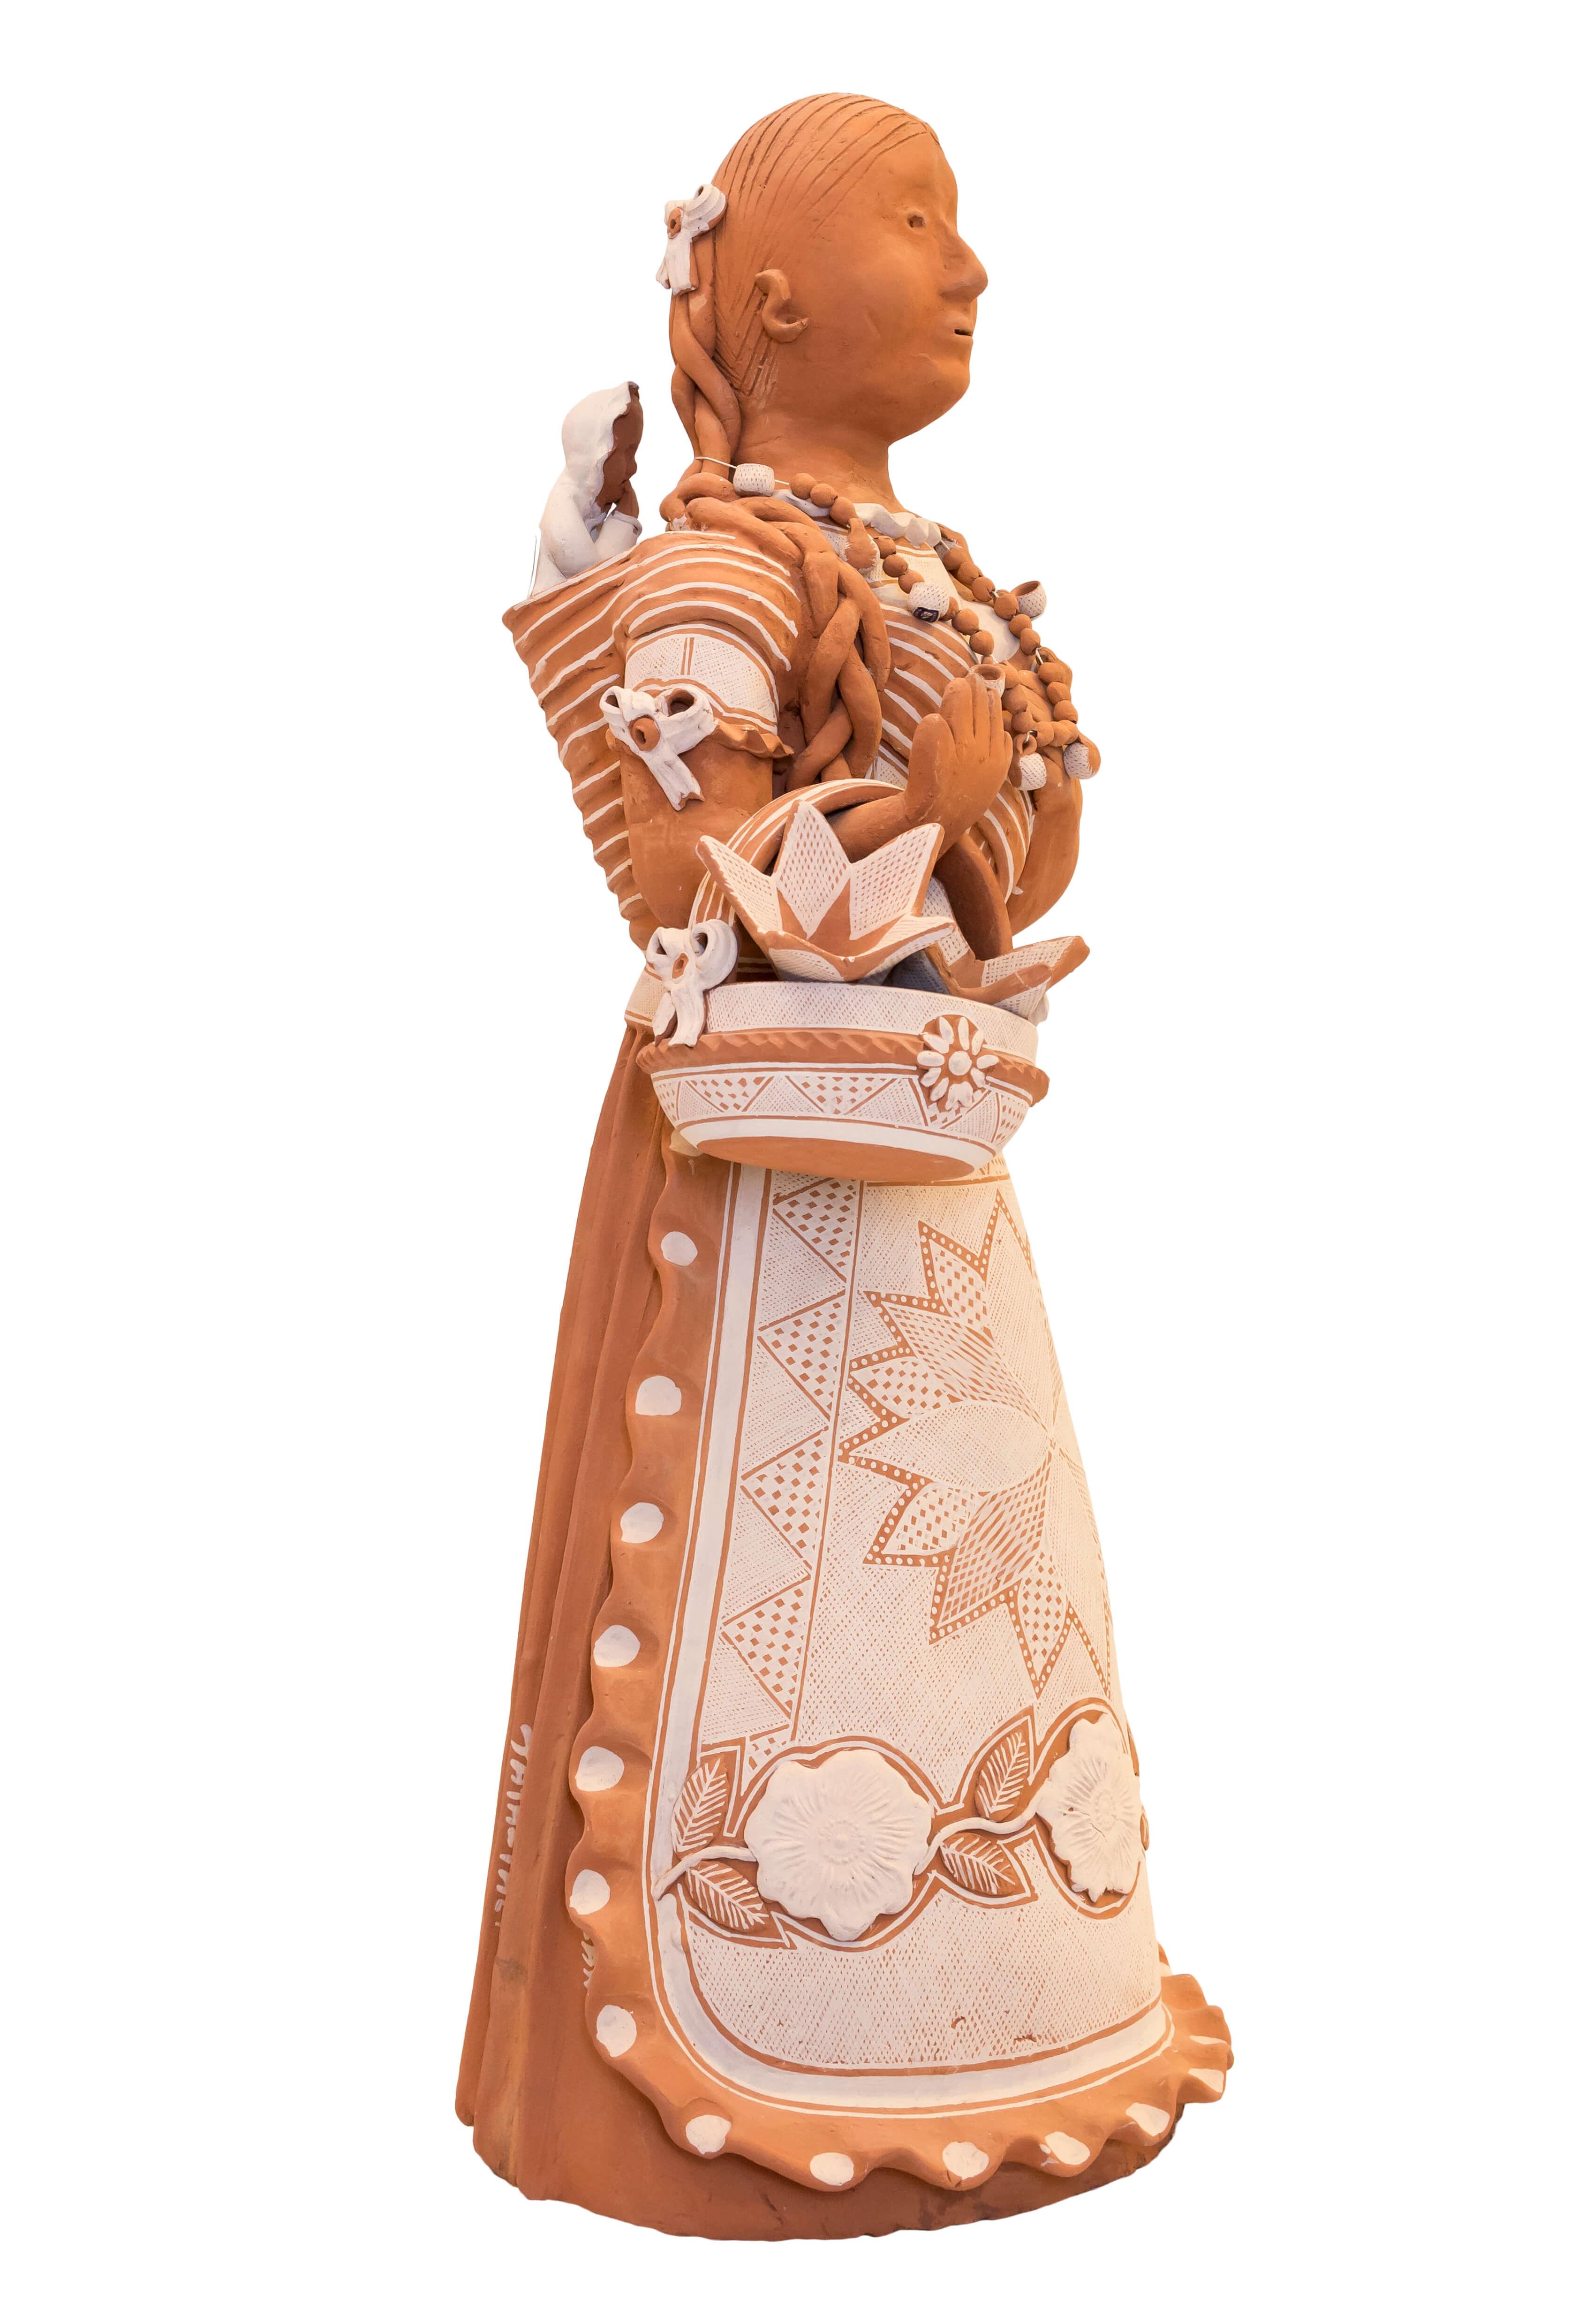 Muñeca Guare Mexicana en cerámica